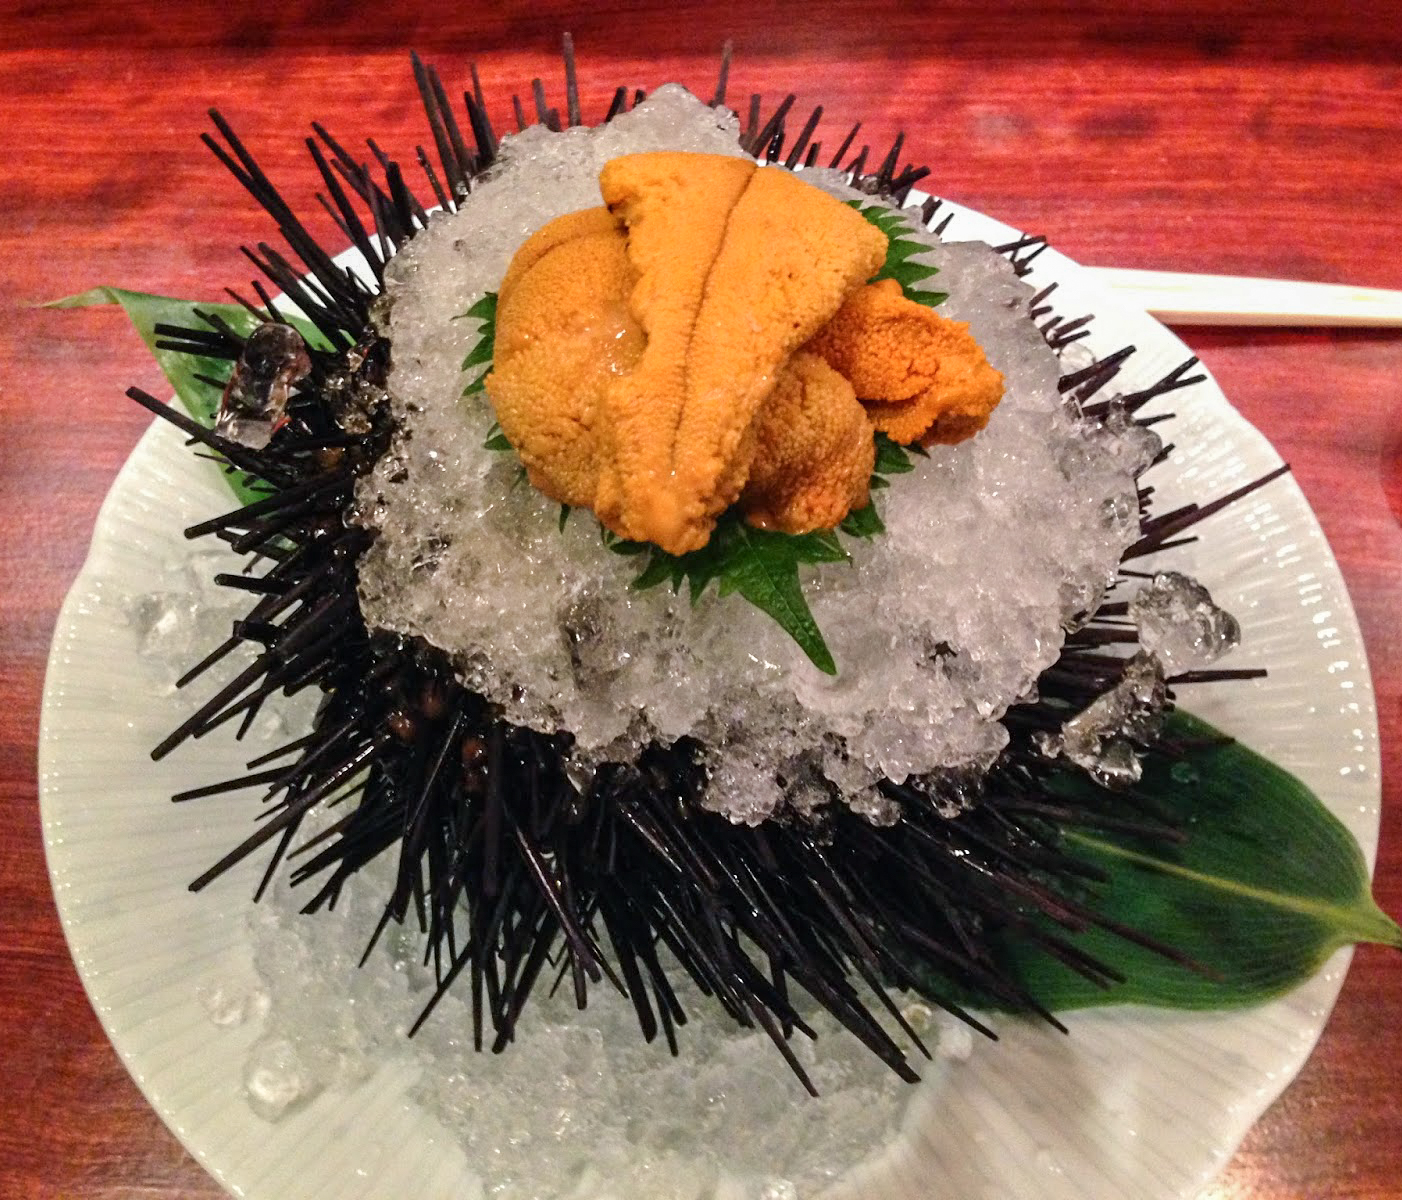 Sea urchin from Santa Barbara *